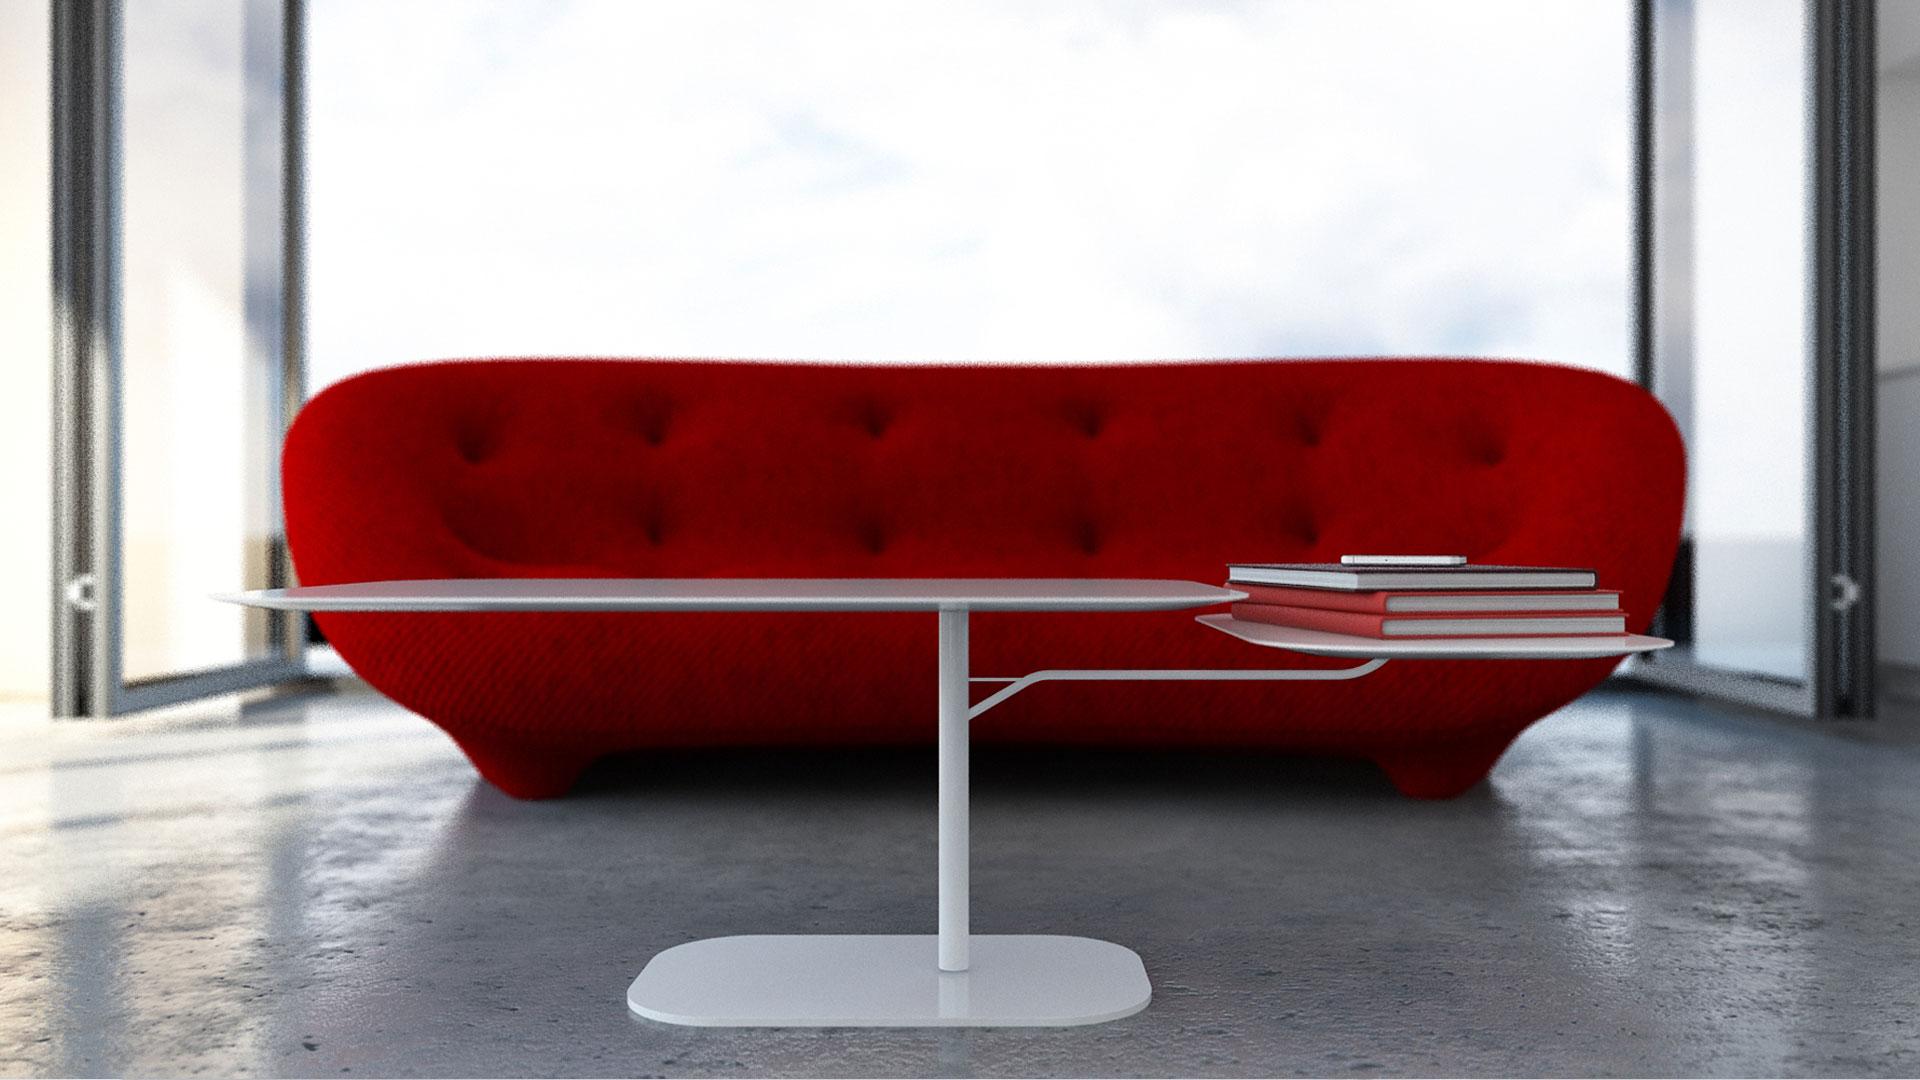 canapé ploom, beton ciré, texture beton, beton ciré 3ds max, beton ciré vray,